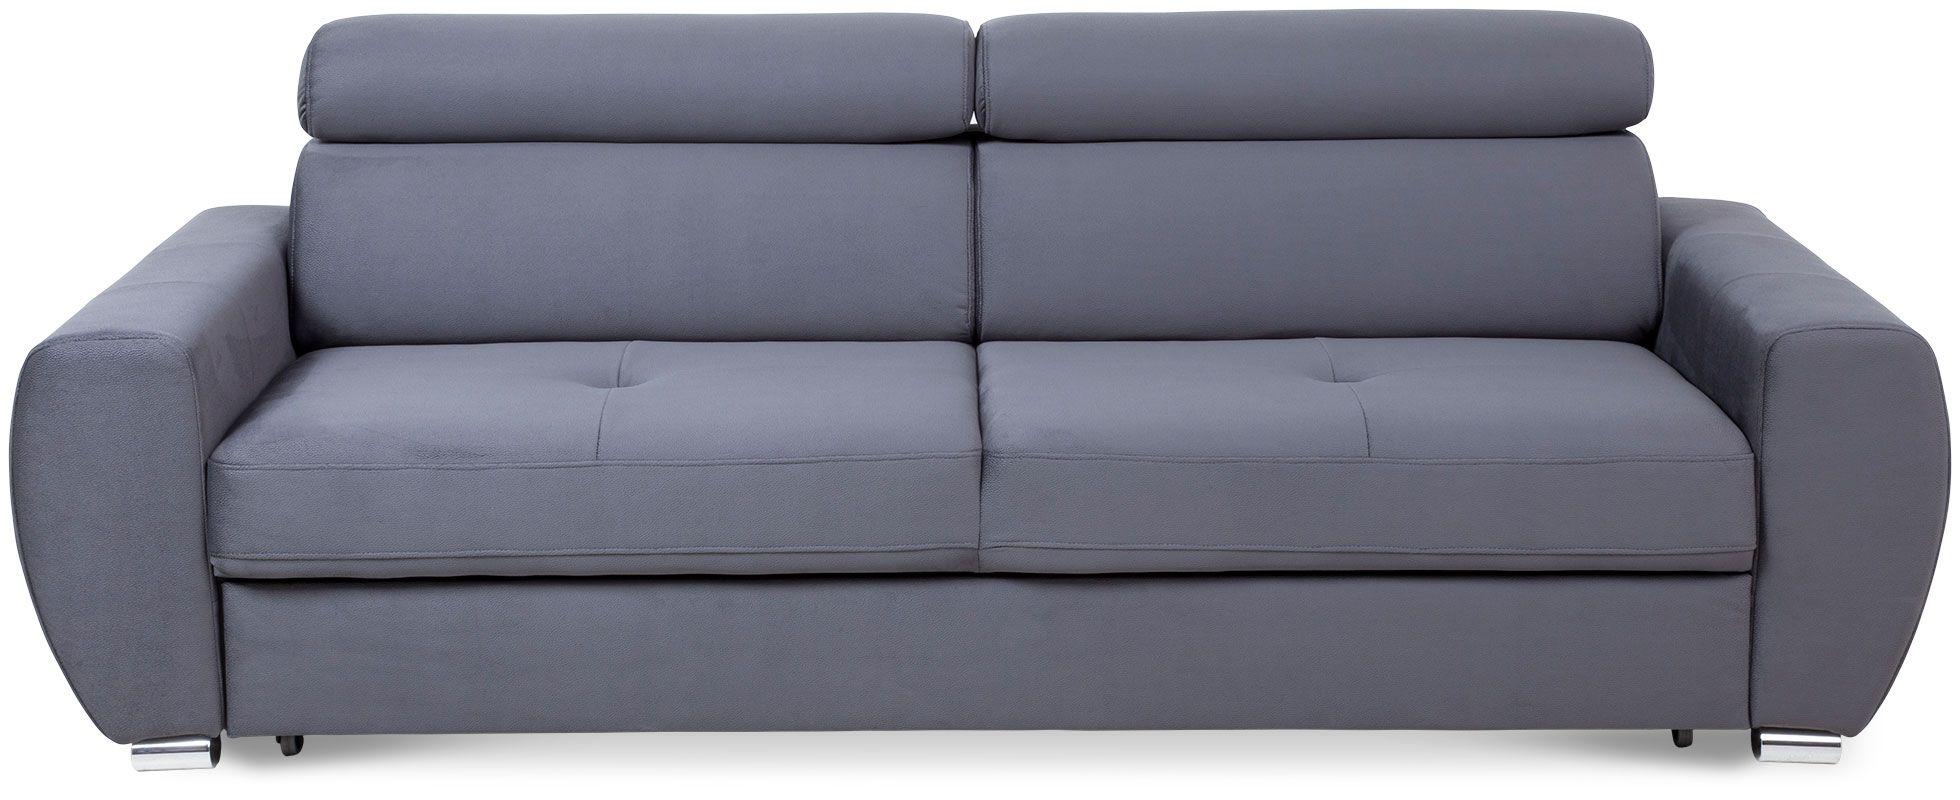 sofa matteo popiel solar96 5